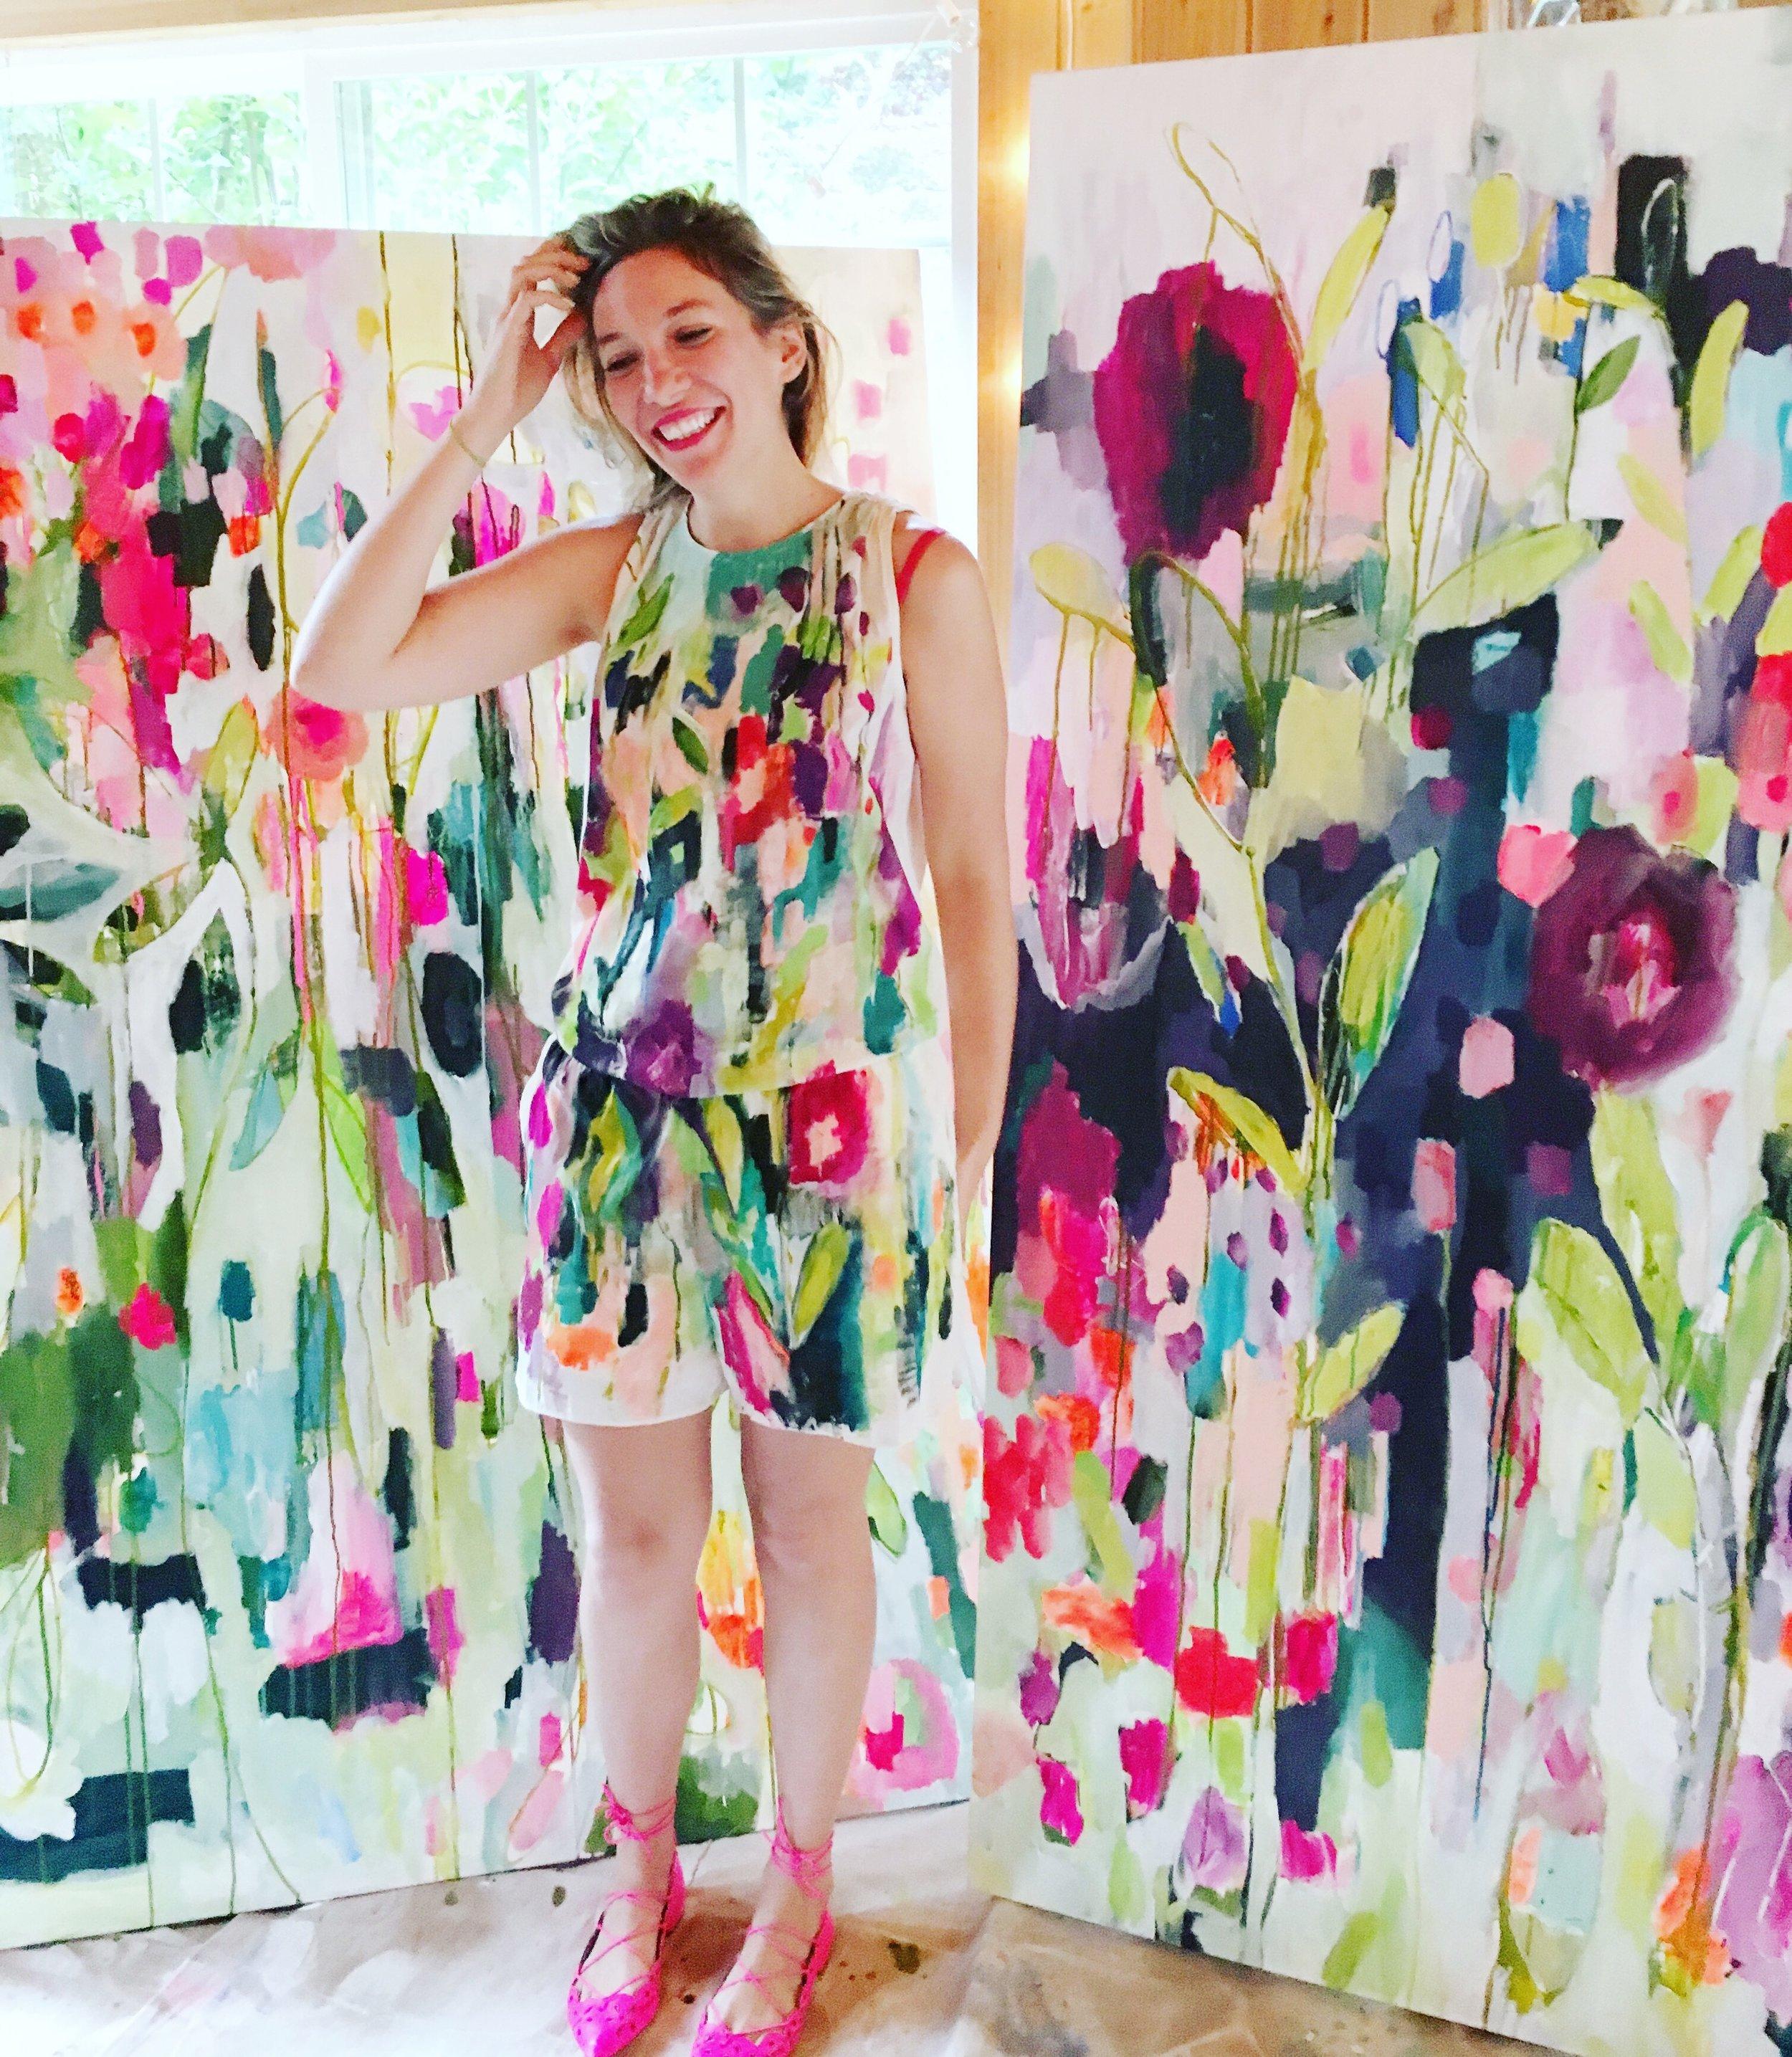 Artfully Awear x Carrie Schmitt.Courtesy of Ariel Adkins.